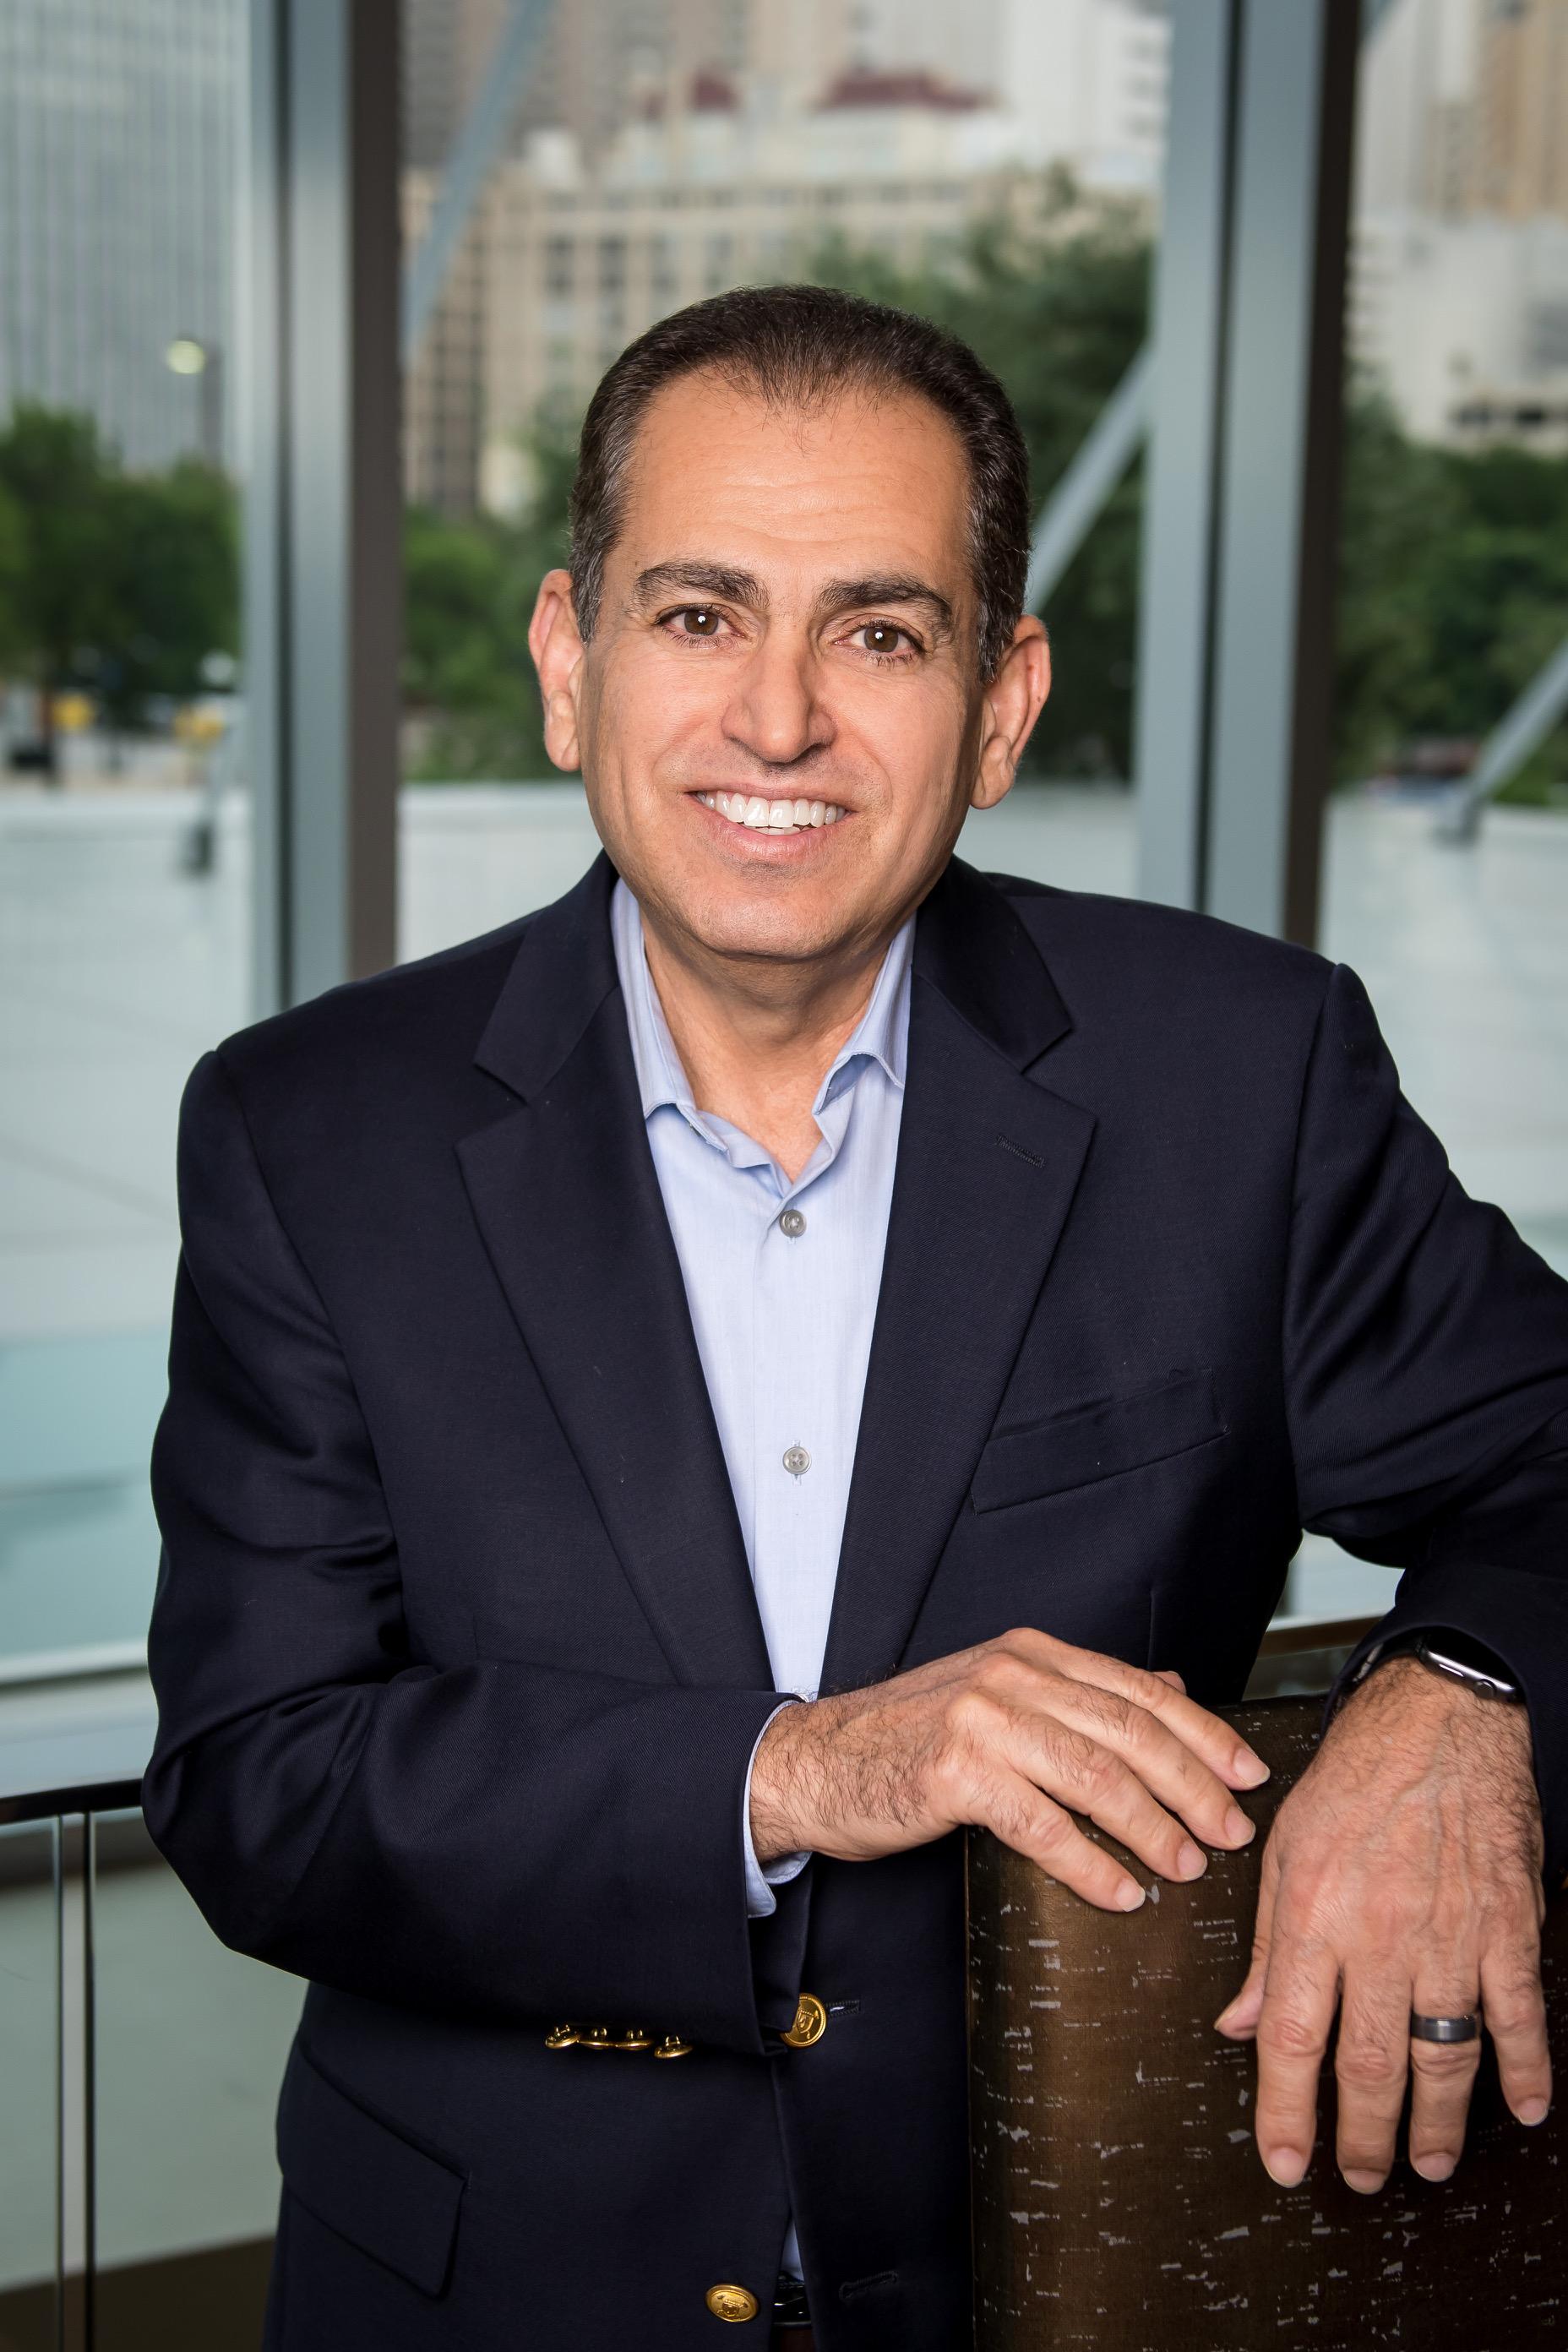 Moe Mustafa, VP AT&T